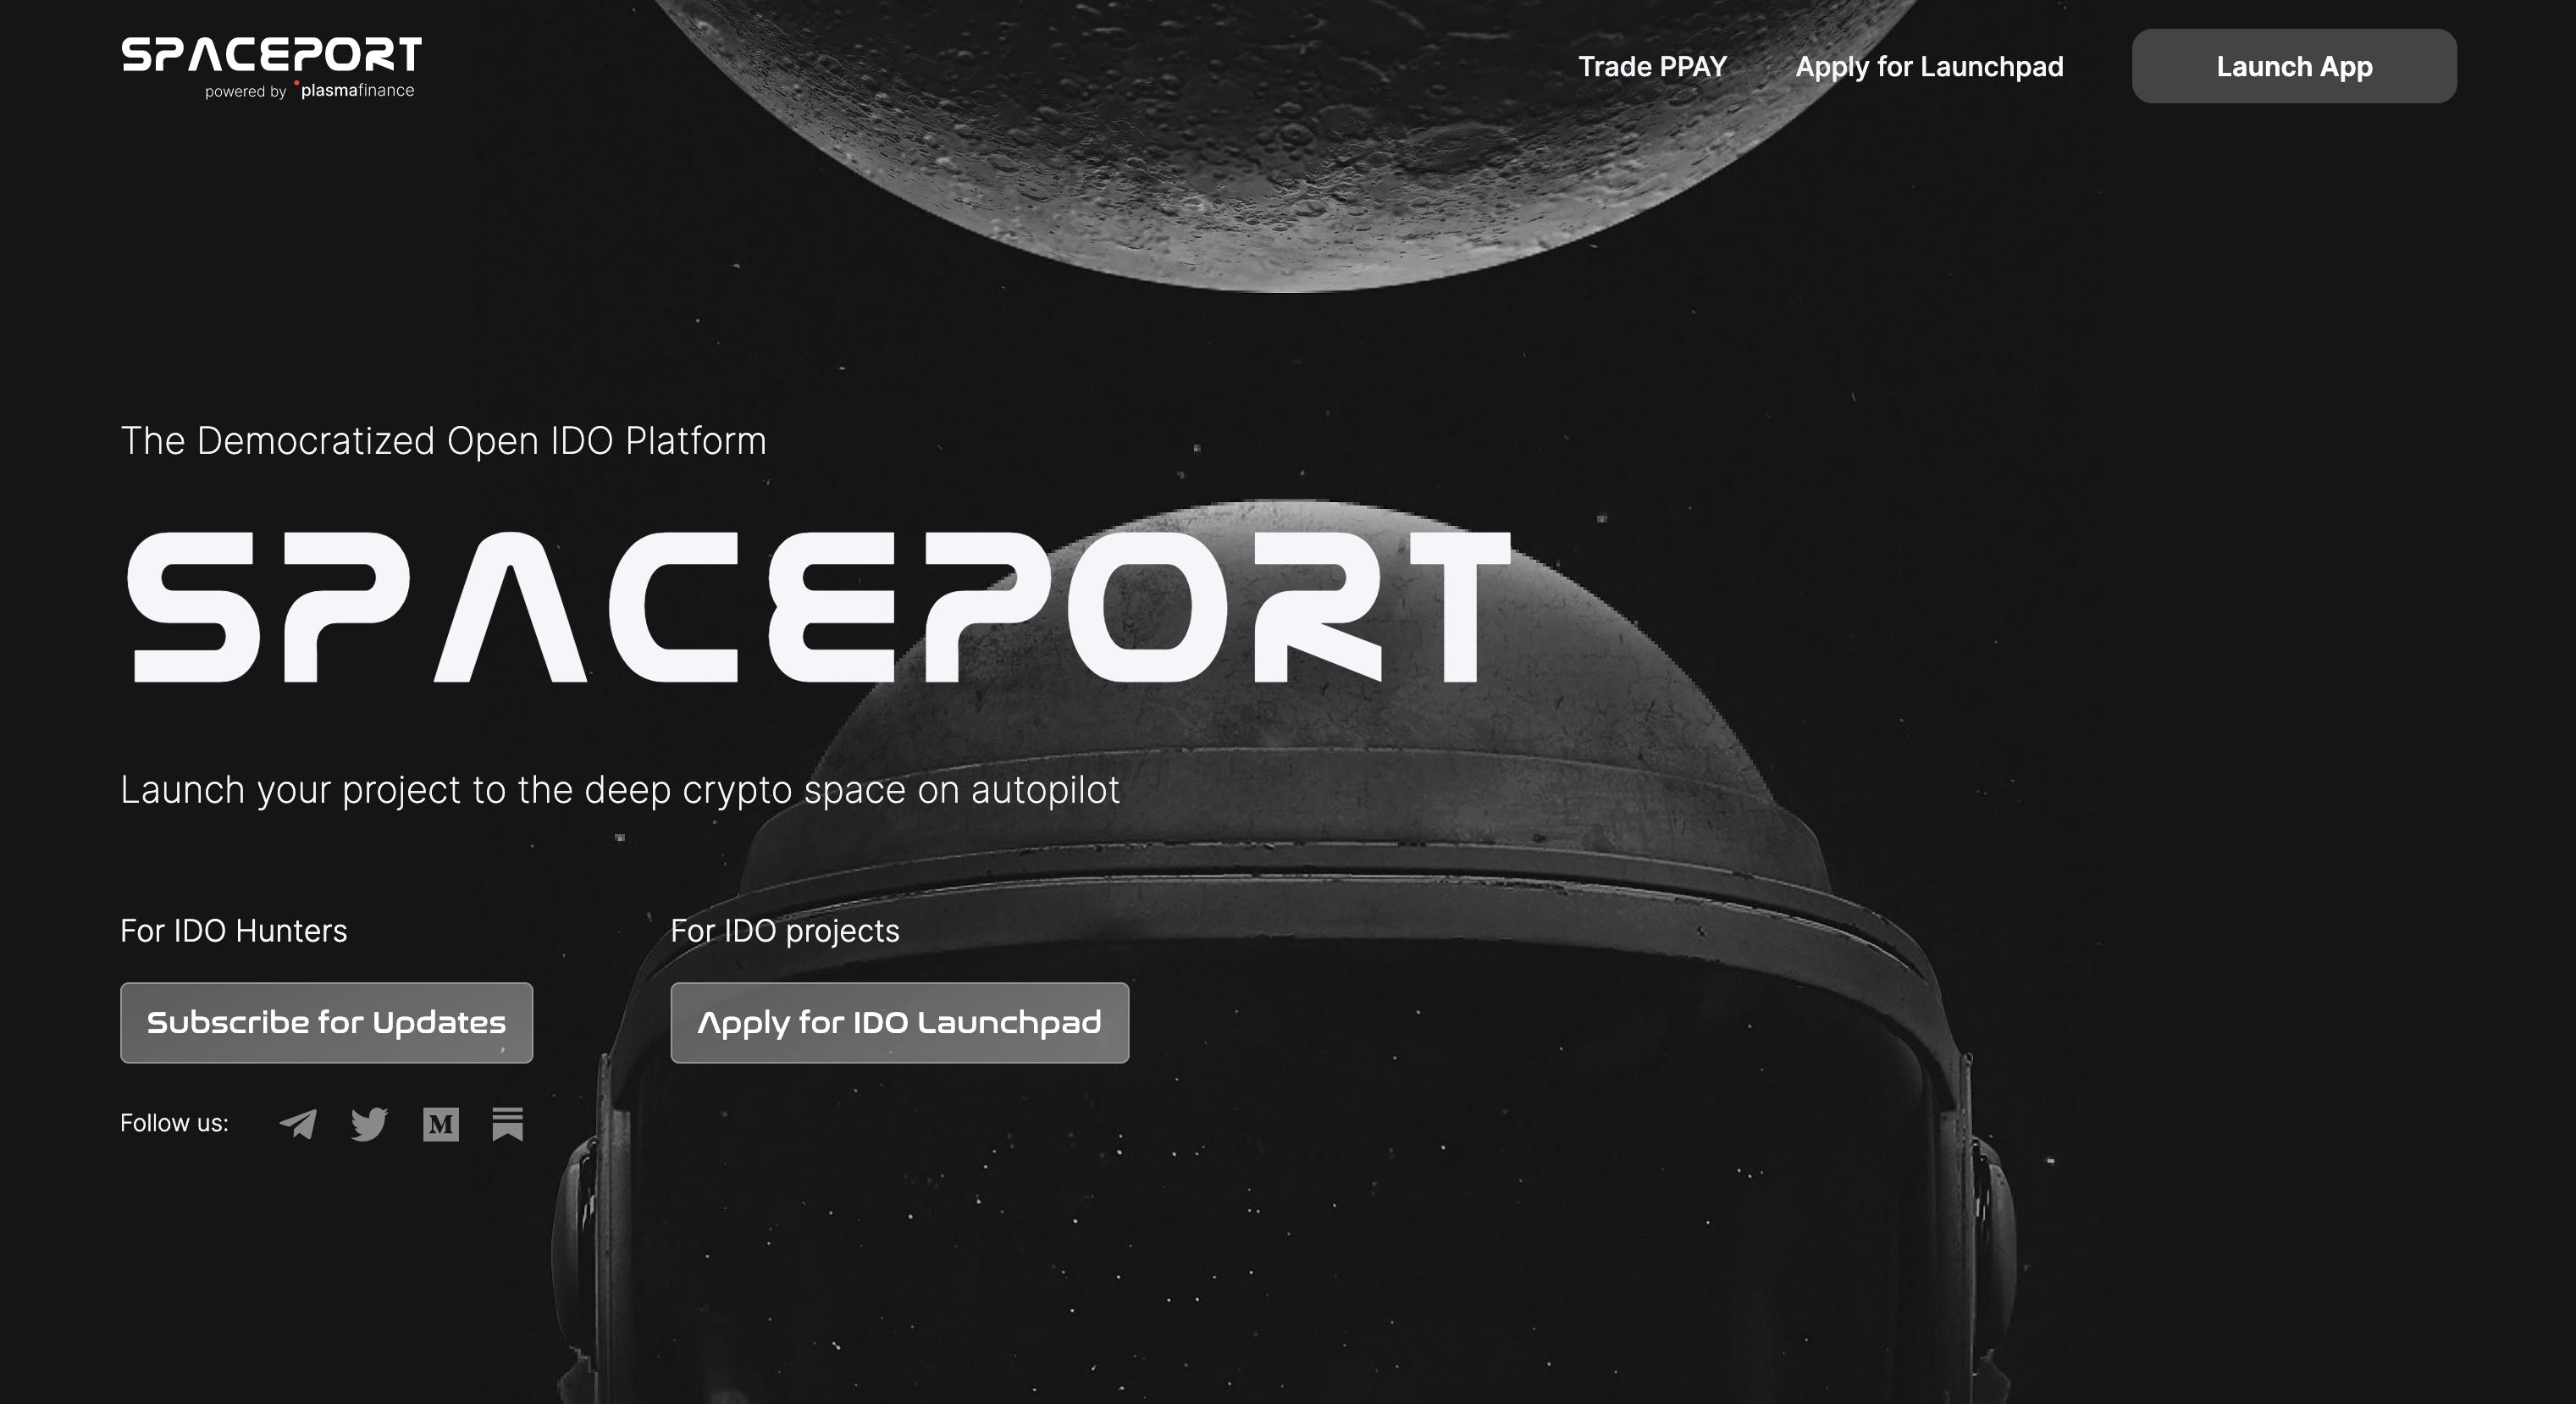 Spaceport - Decentralized Cross-Chain IDO Launchpad - Spaceport-分散式跨链IDO发射台